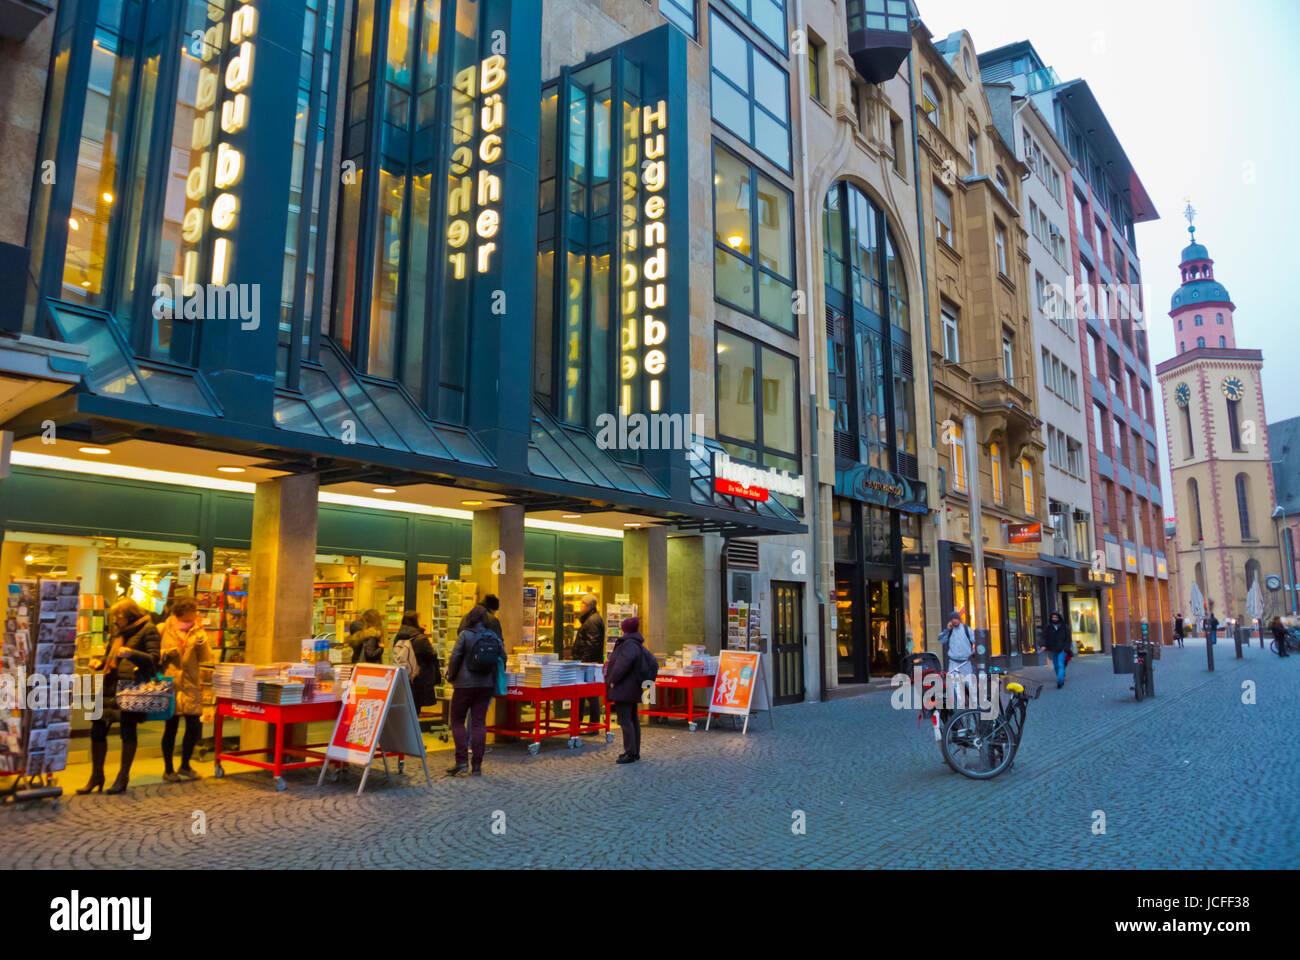 Hugendubel bookshop, Steinweg, Rathenauplatz, Frankfurt am Main ...